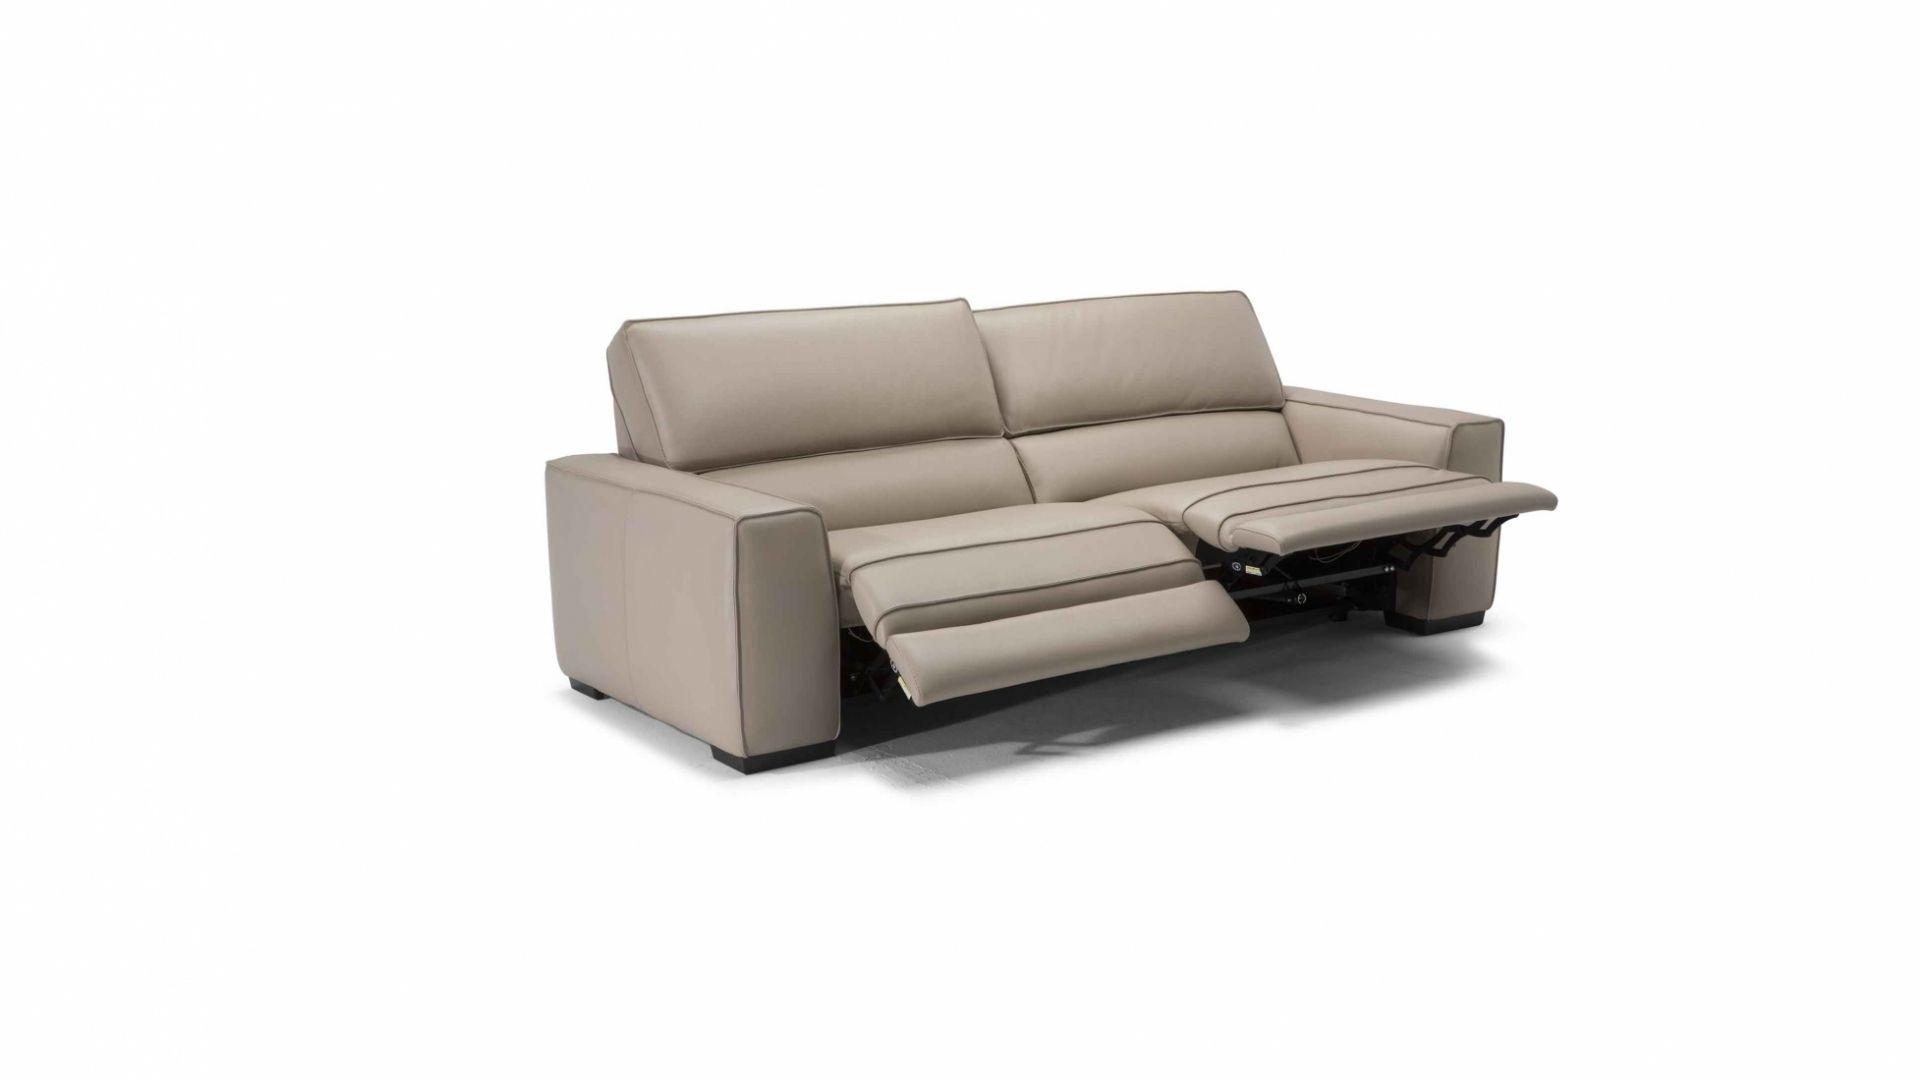 14 Extraoradinary Natuzzi Leather Sectional Sofa Image Ideas